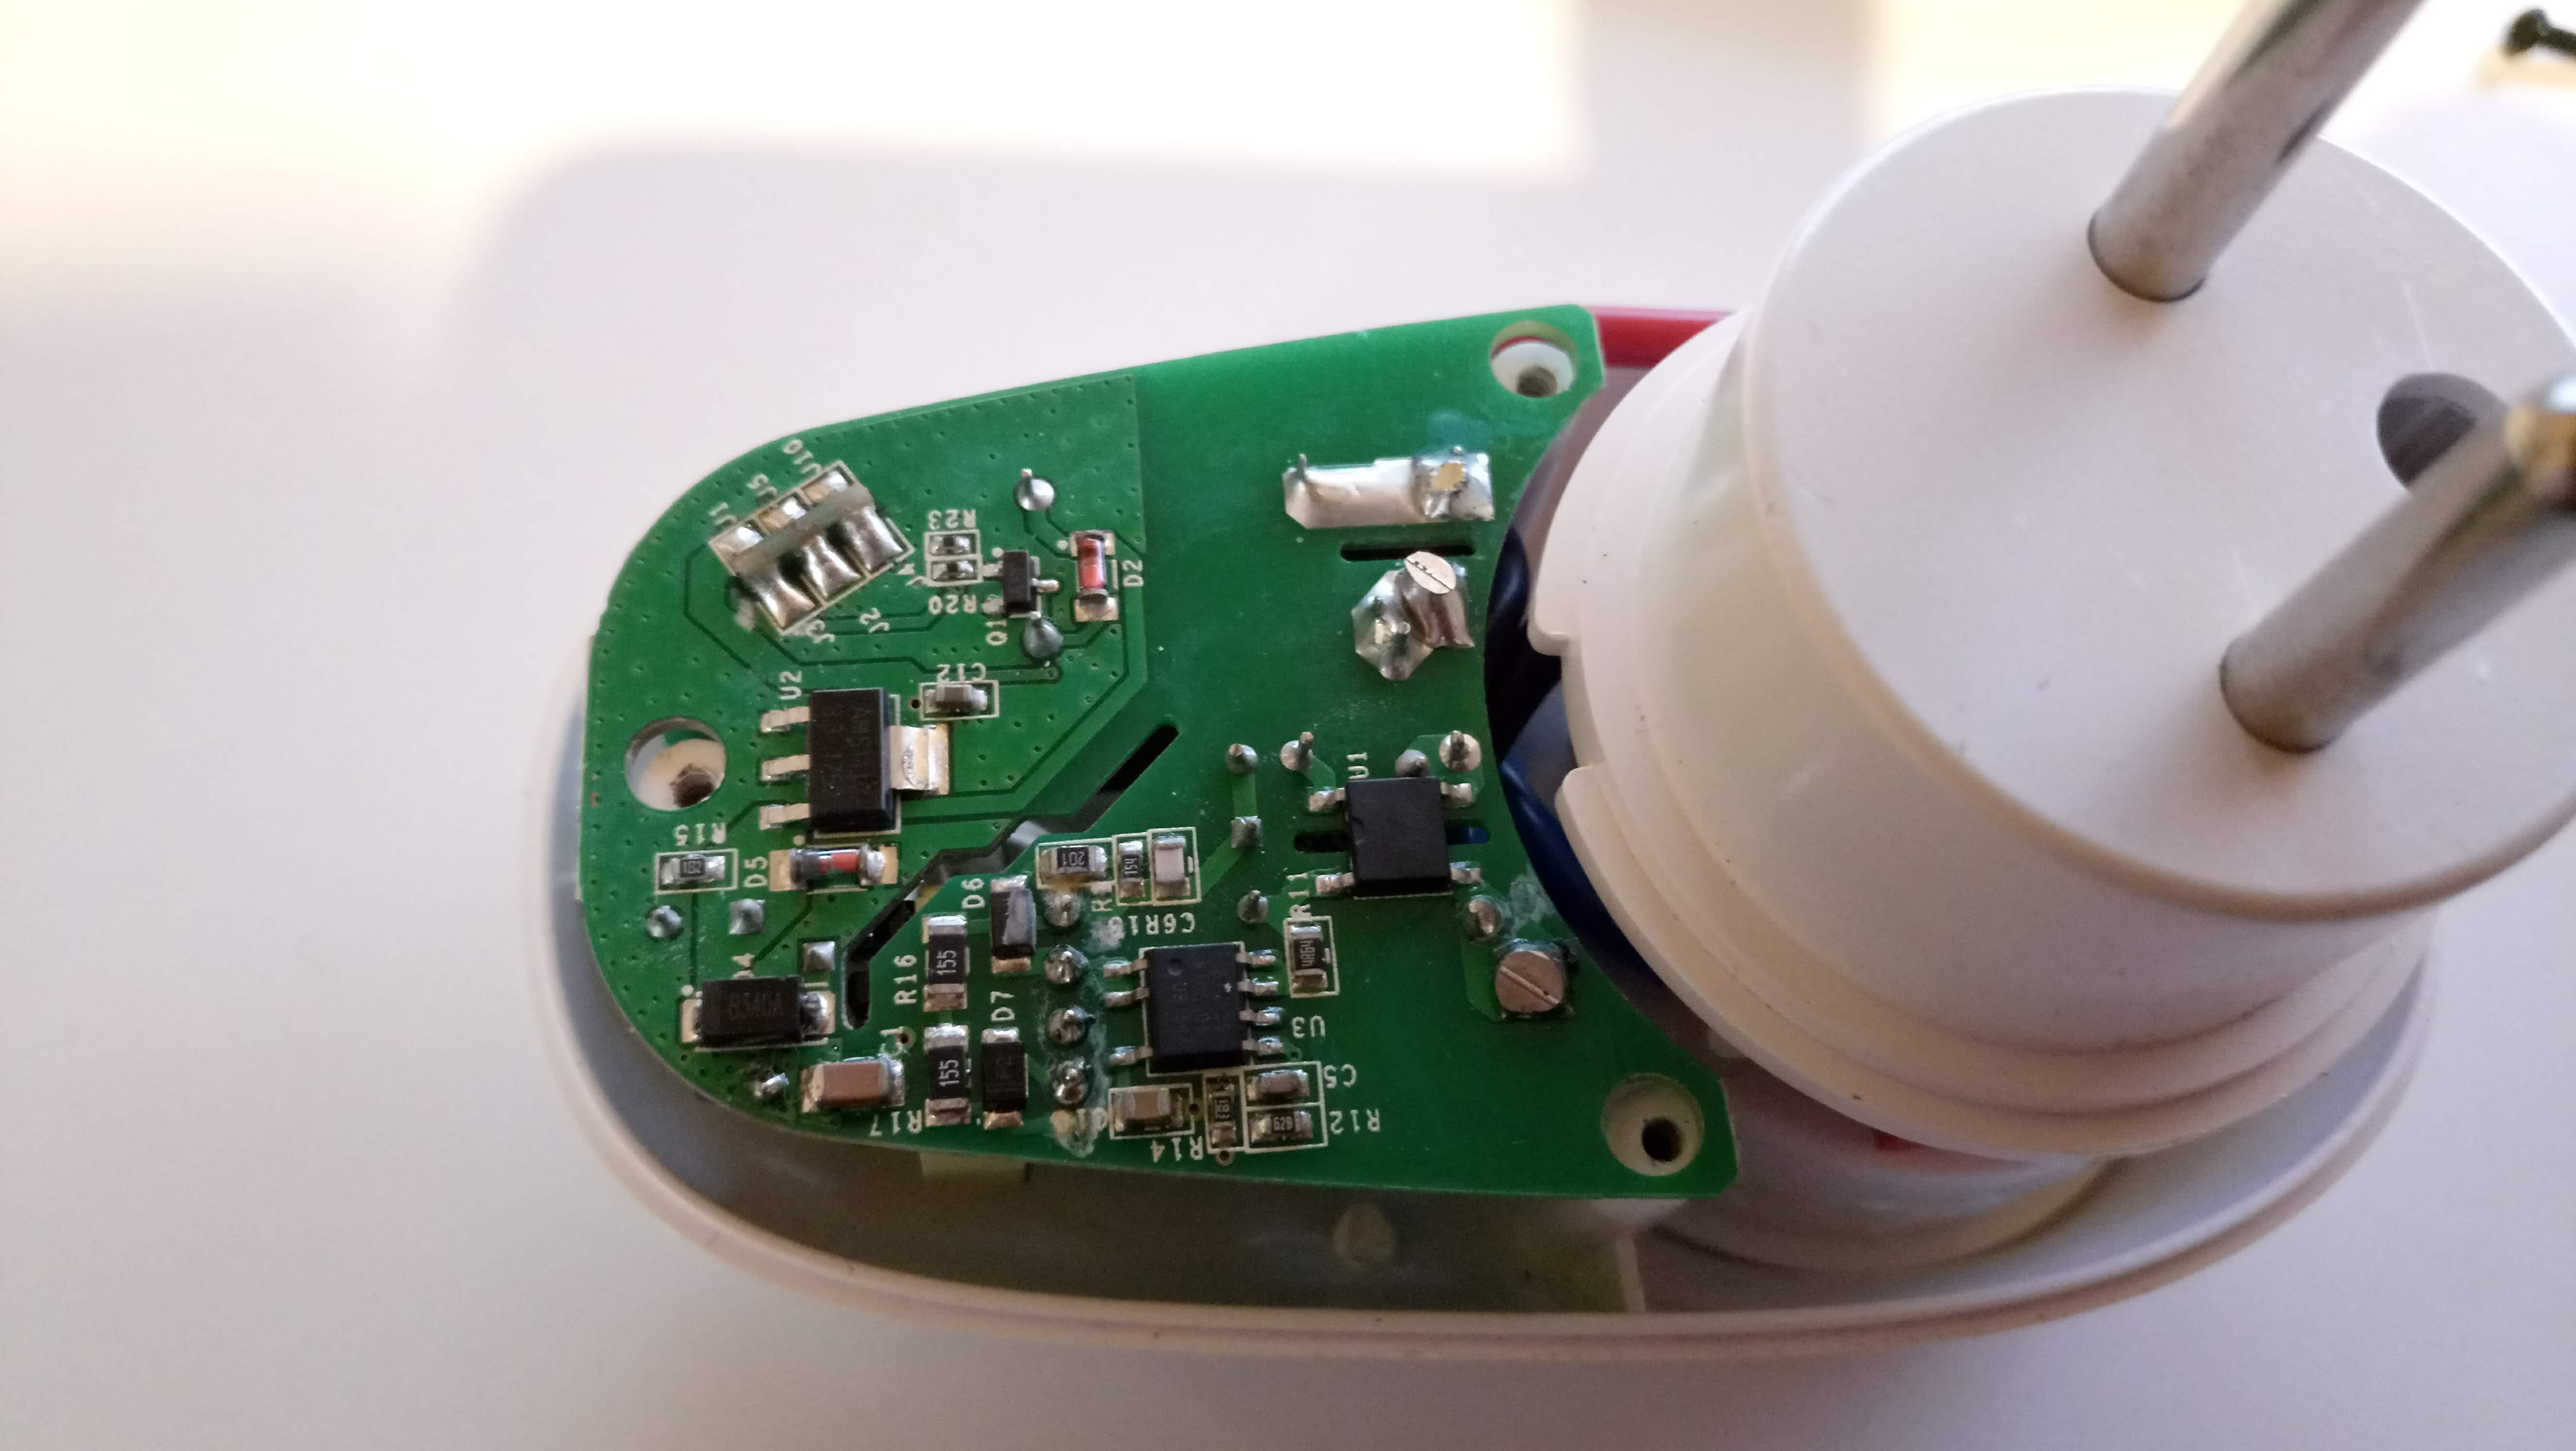 S26 Smart Plug Support Issue 2808 Arendst Sonoff Tasmota Github Tm1638 Datasheet Pdf Pinout Circuit Img 20180824 170702